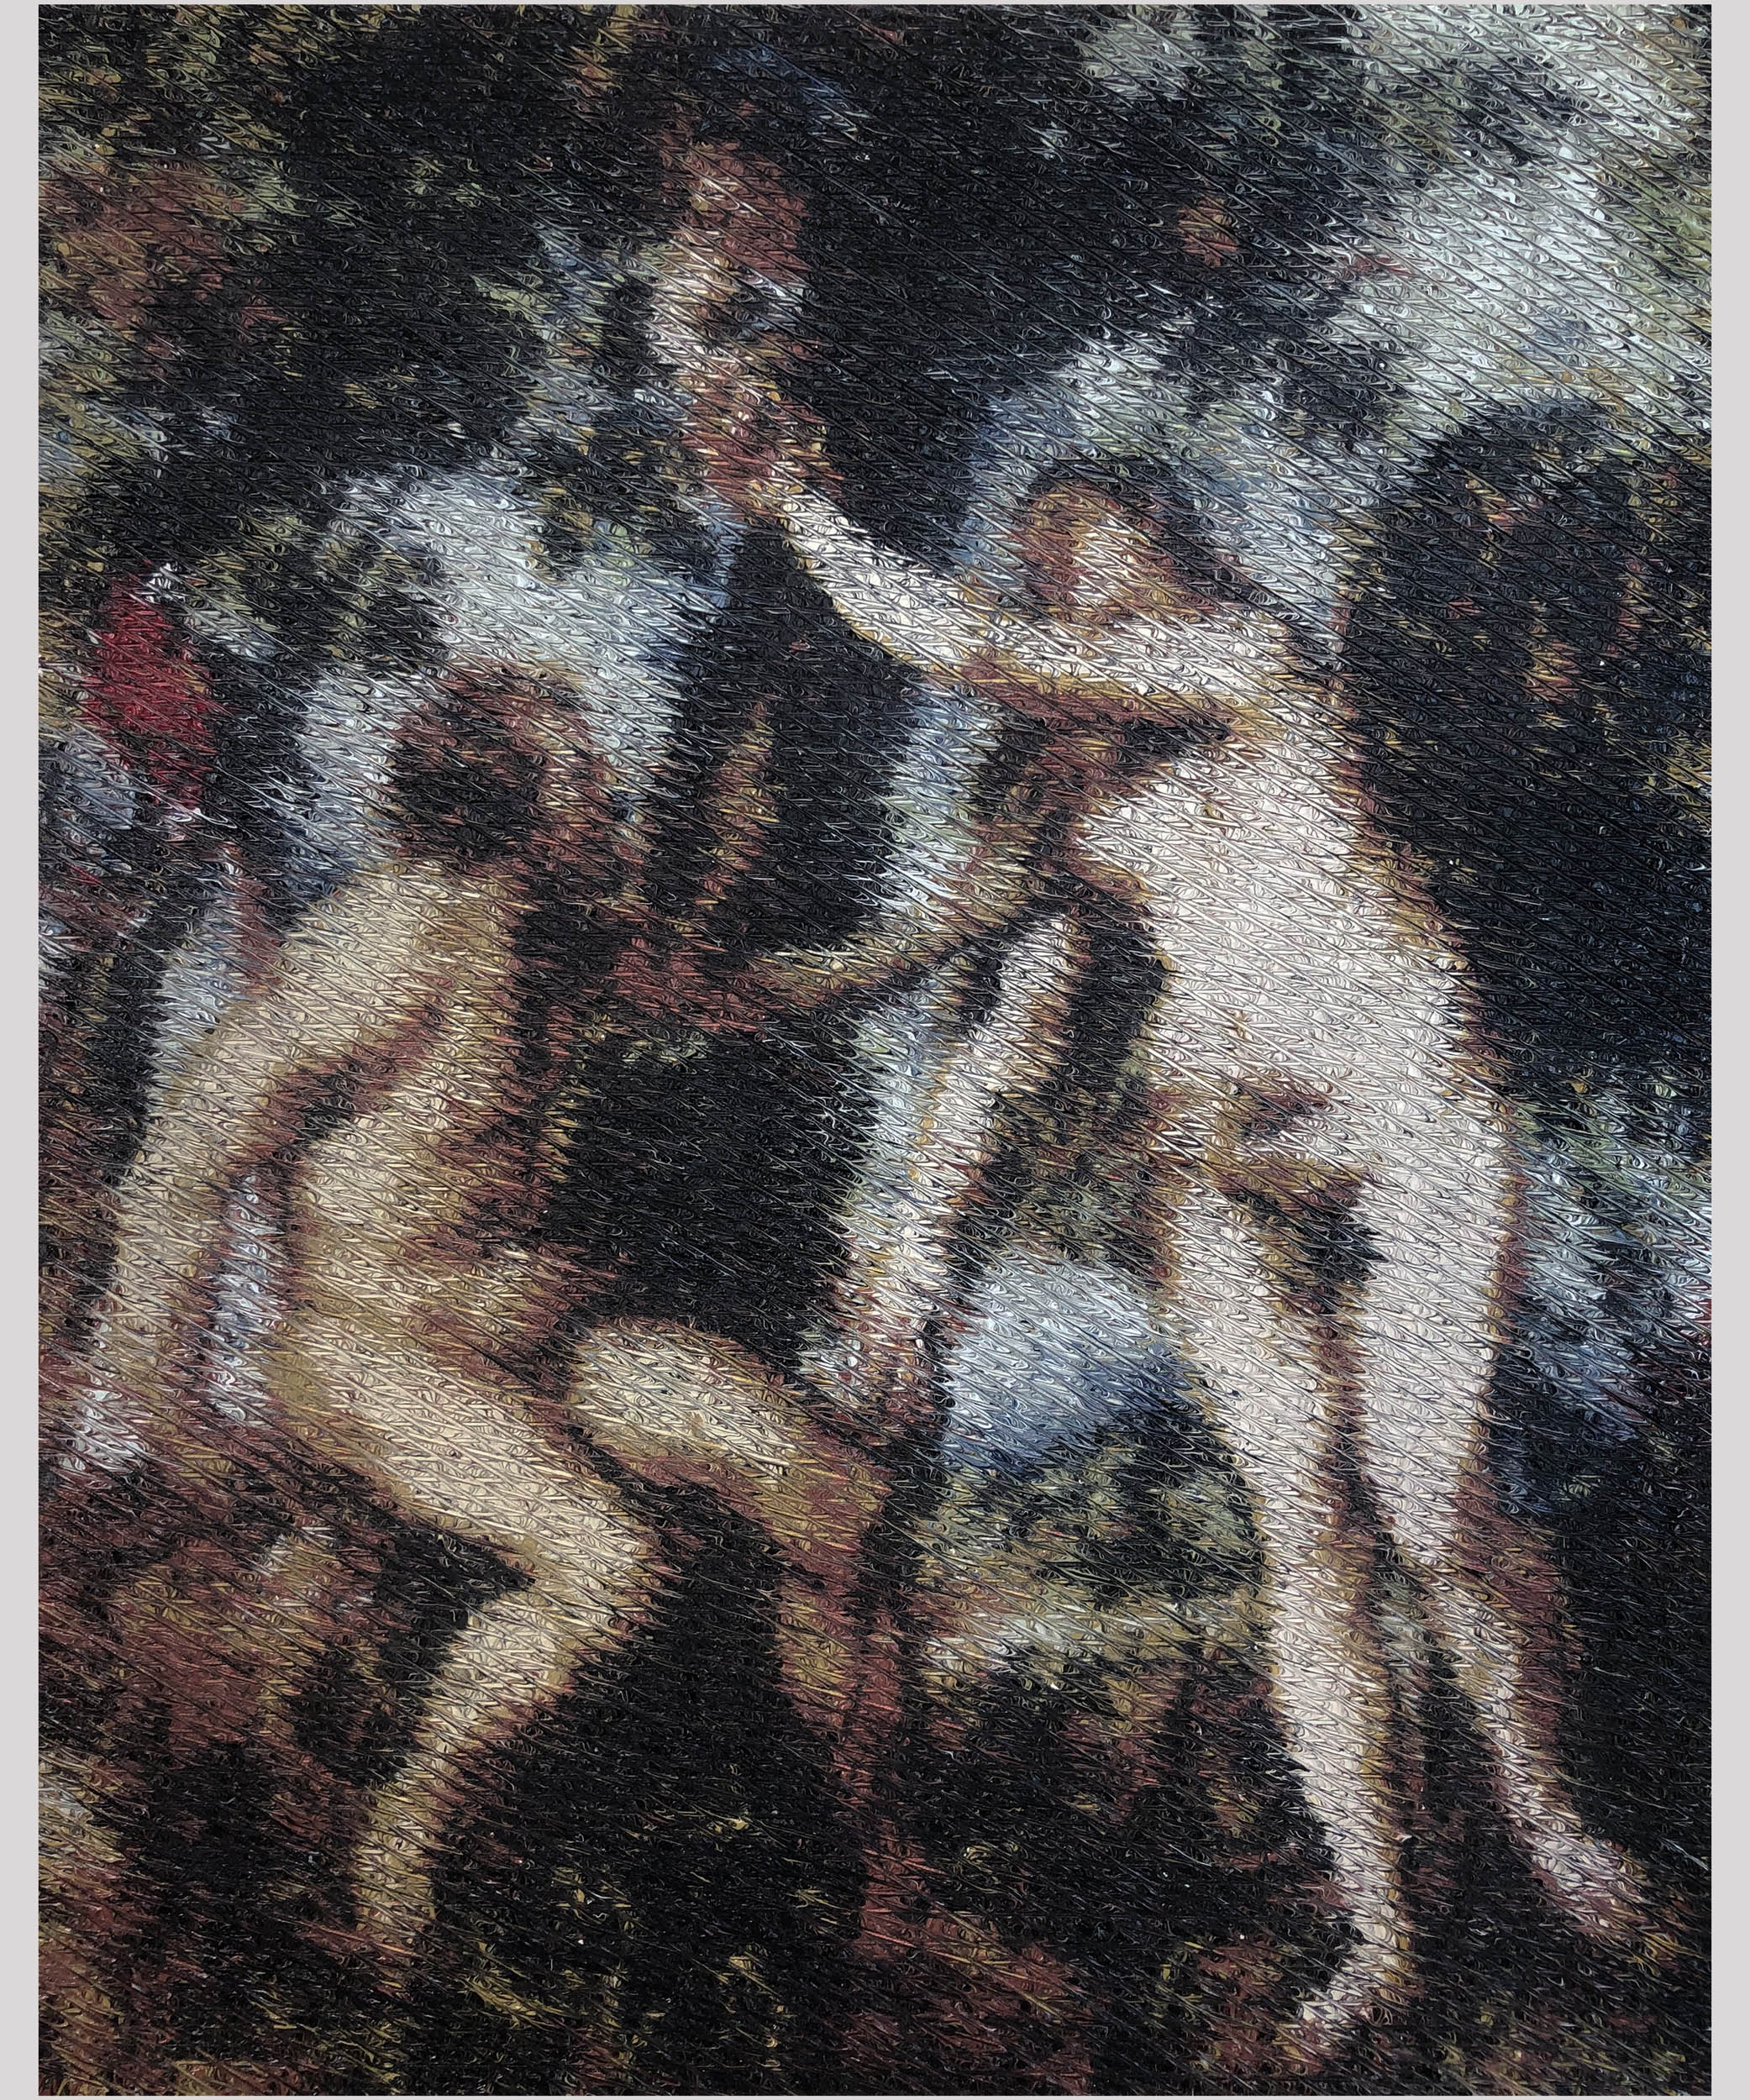 Rubens - Adam i Ewa, 2020